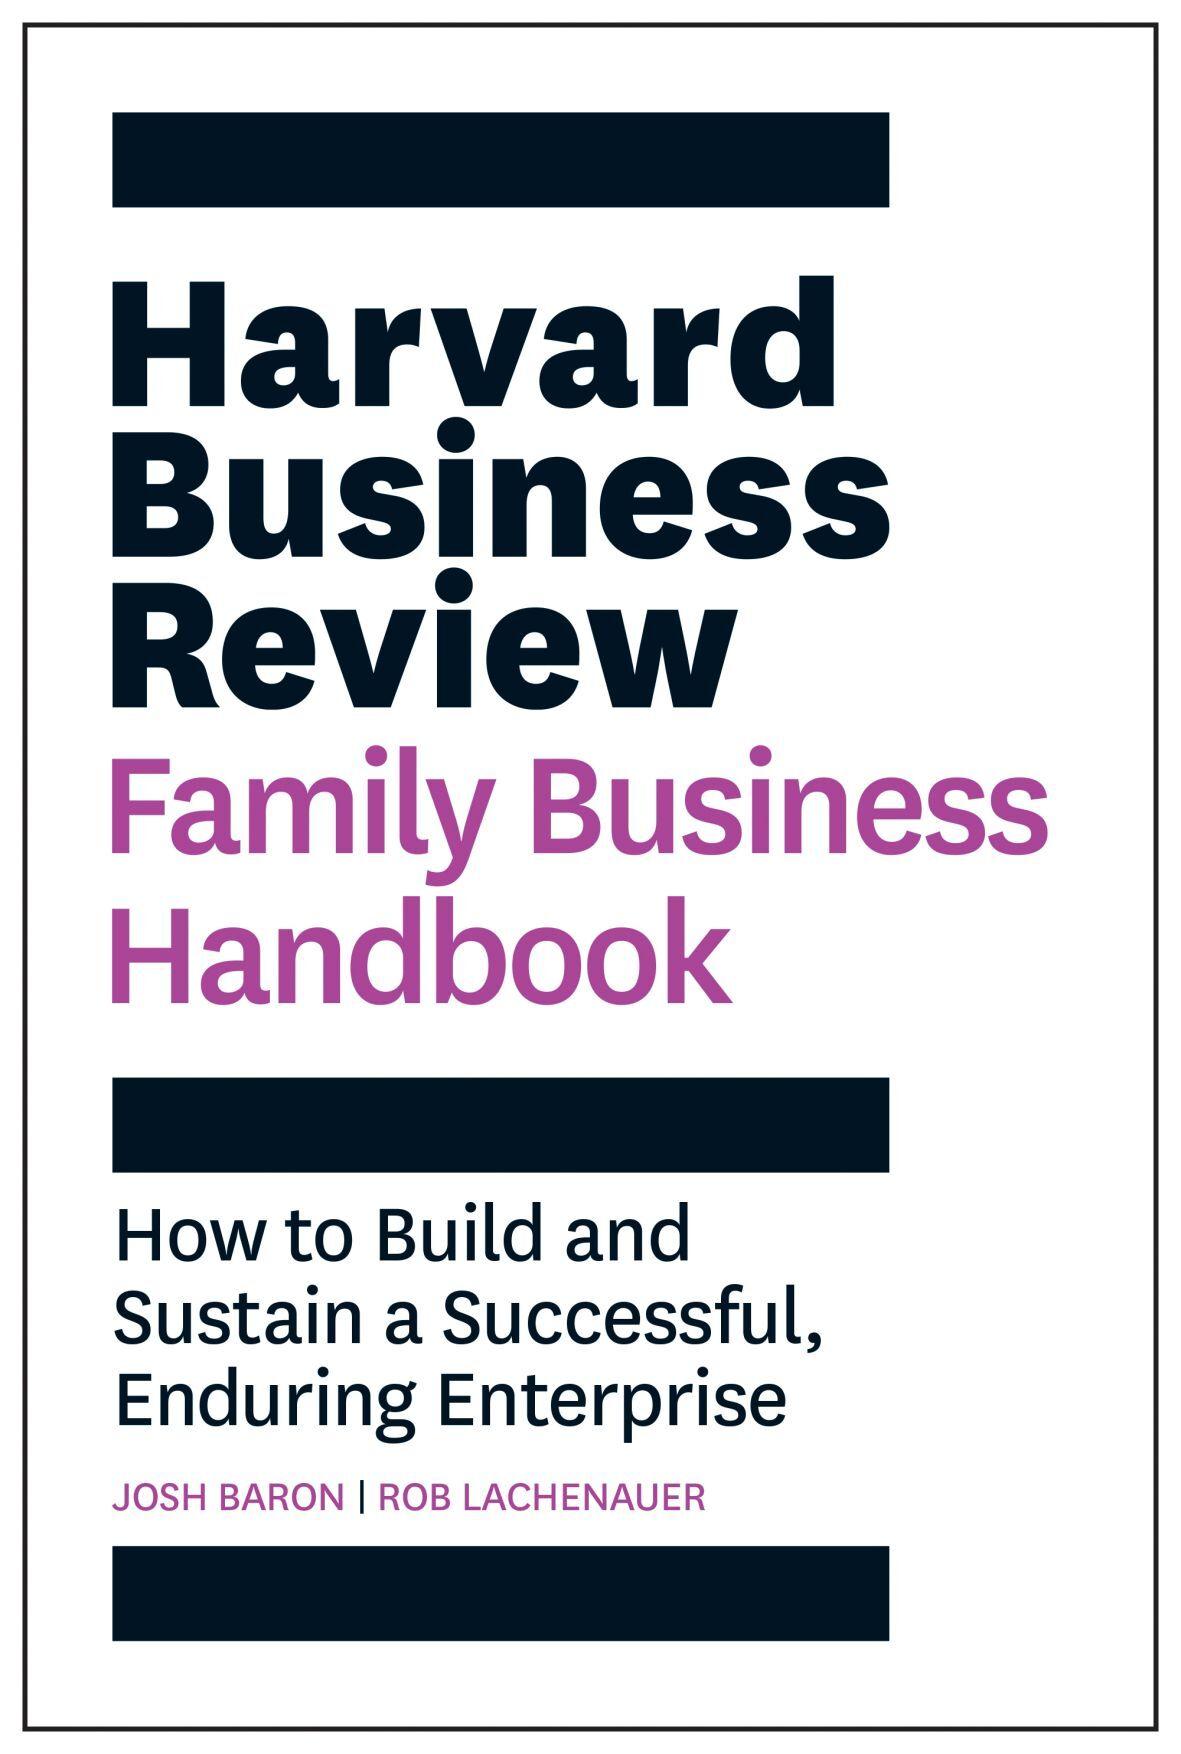 HBR Family Busines sHandbook.jpg